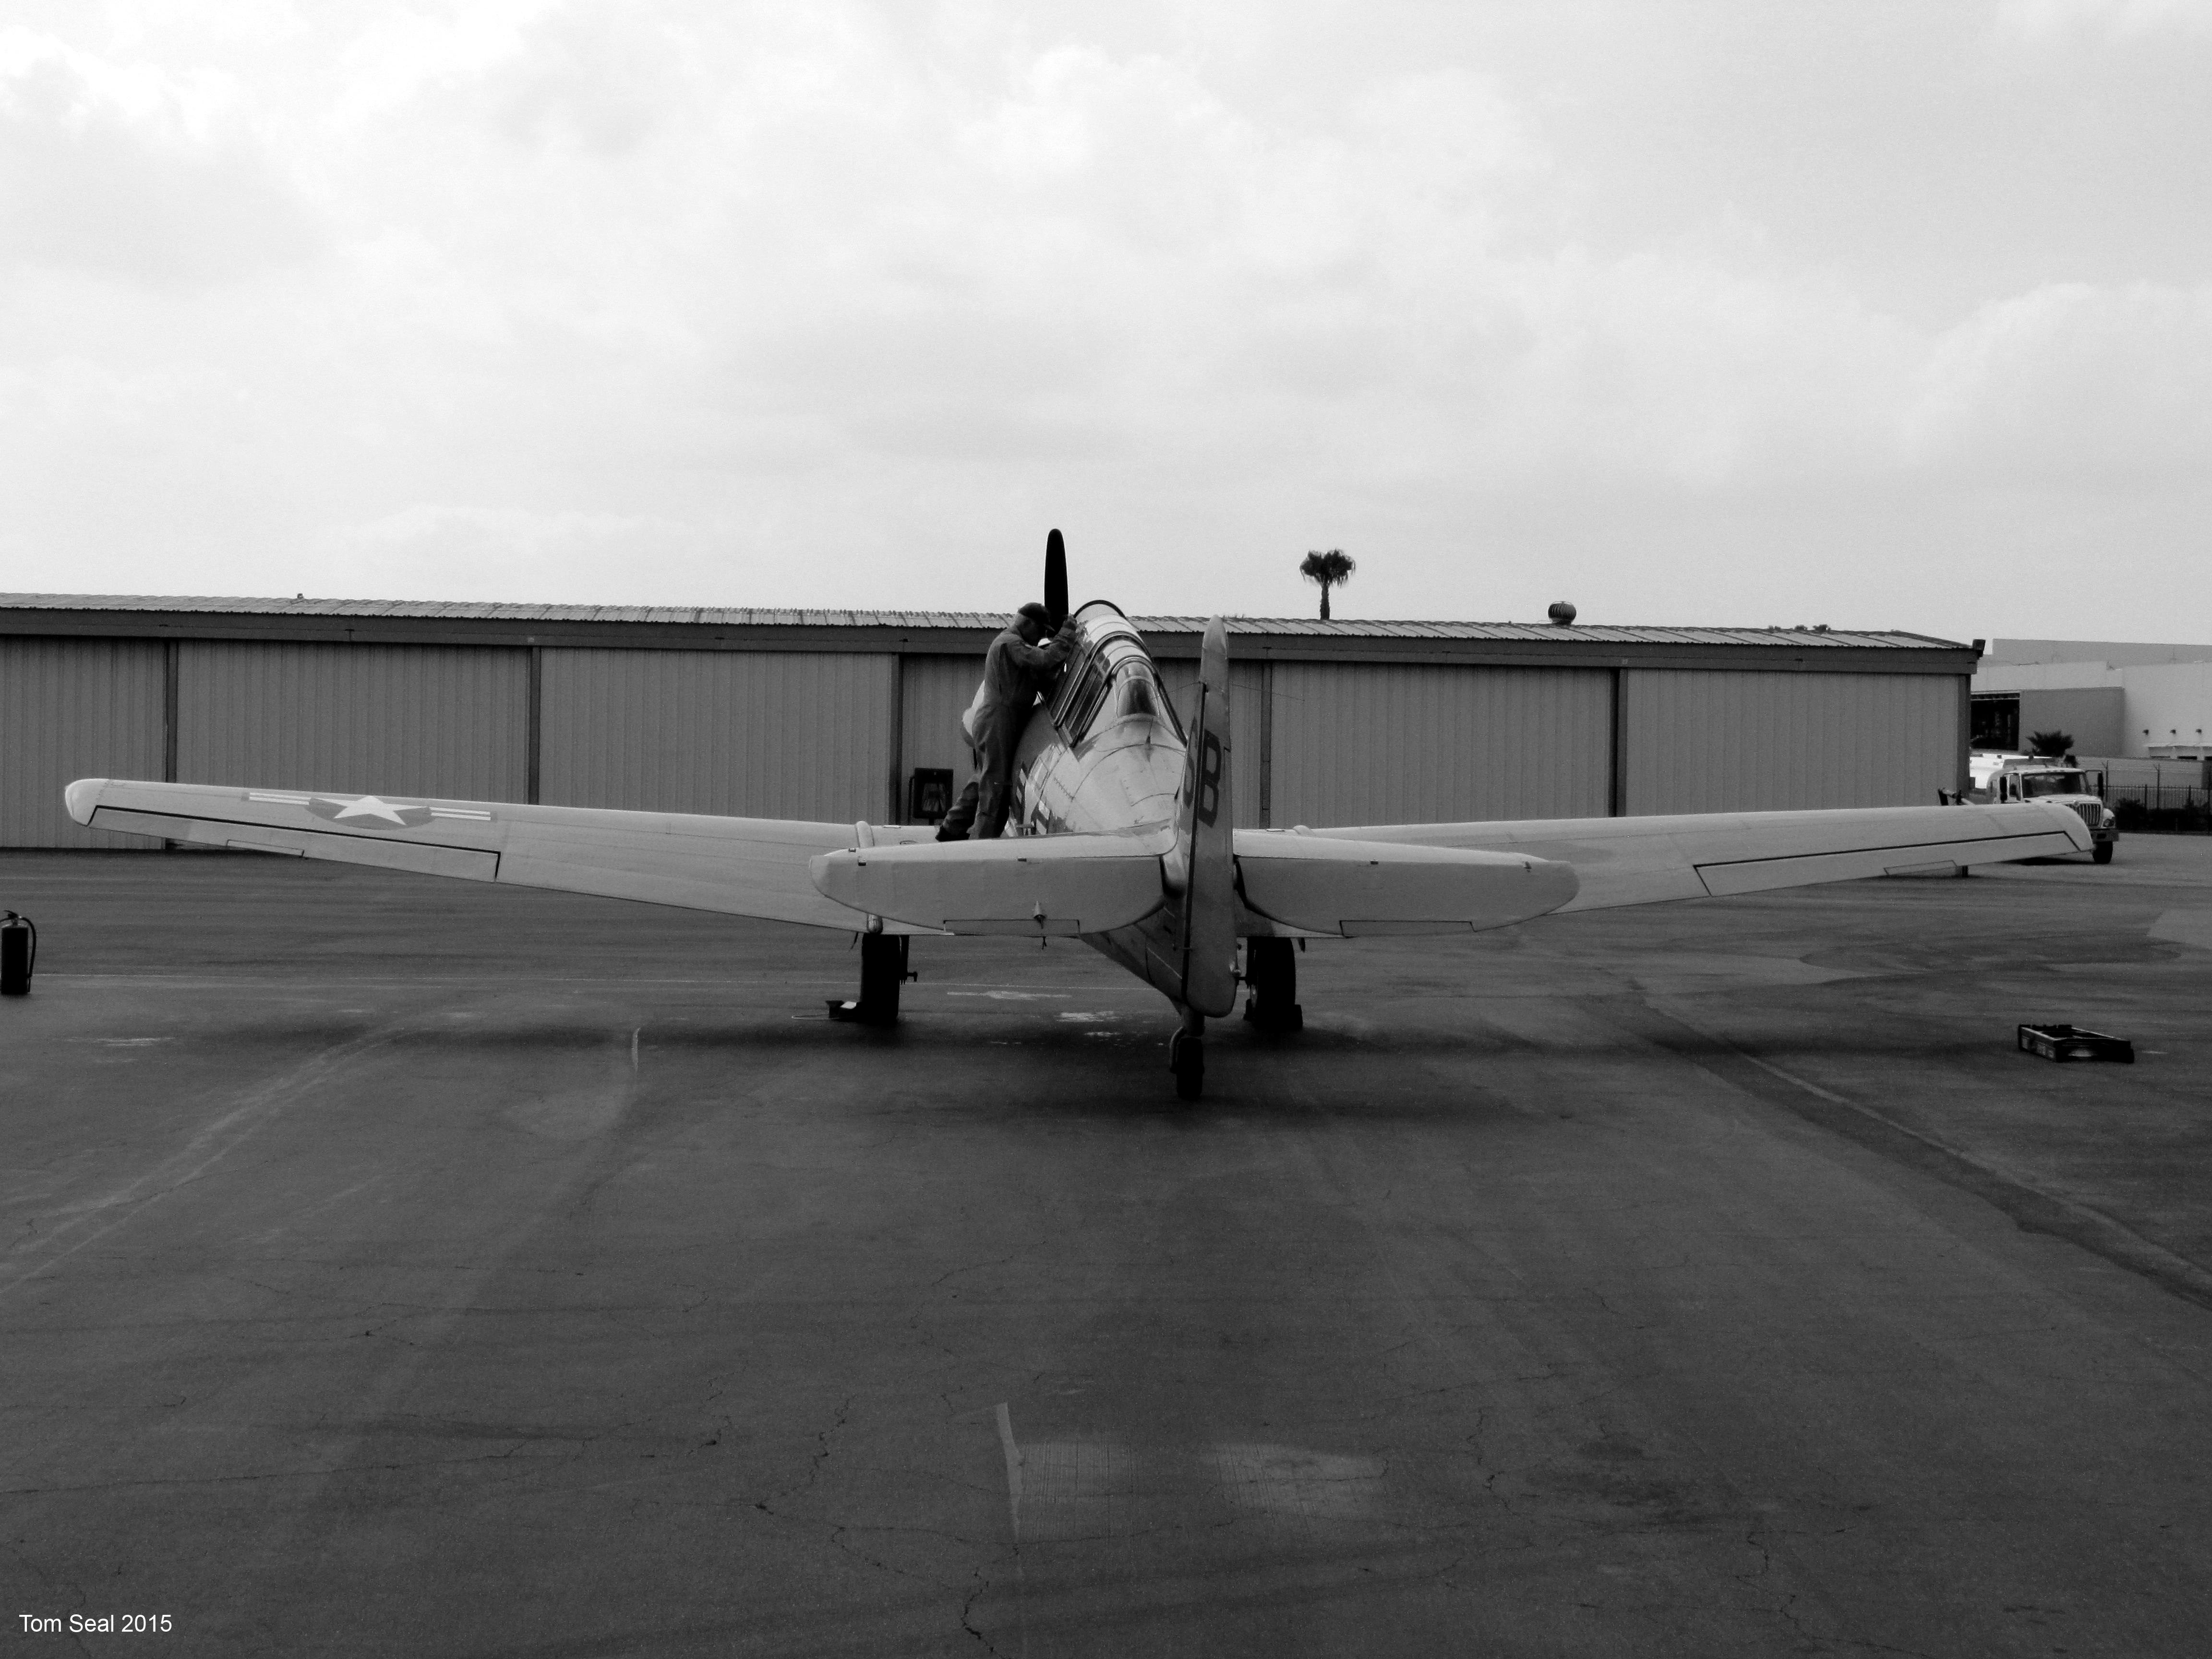 T6 Texan BW by decophoto32